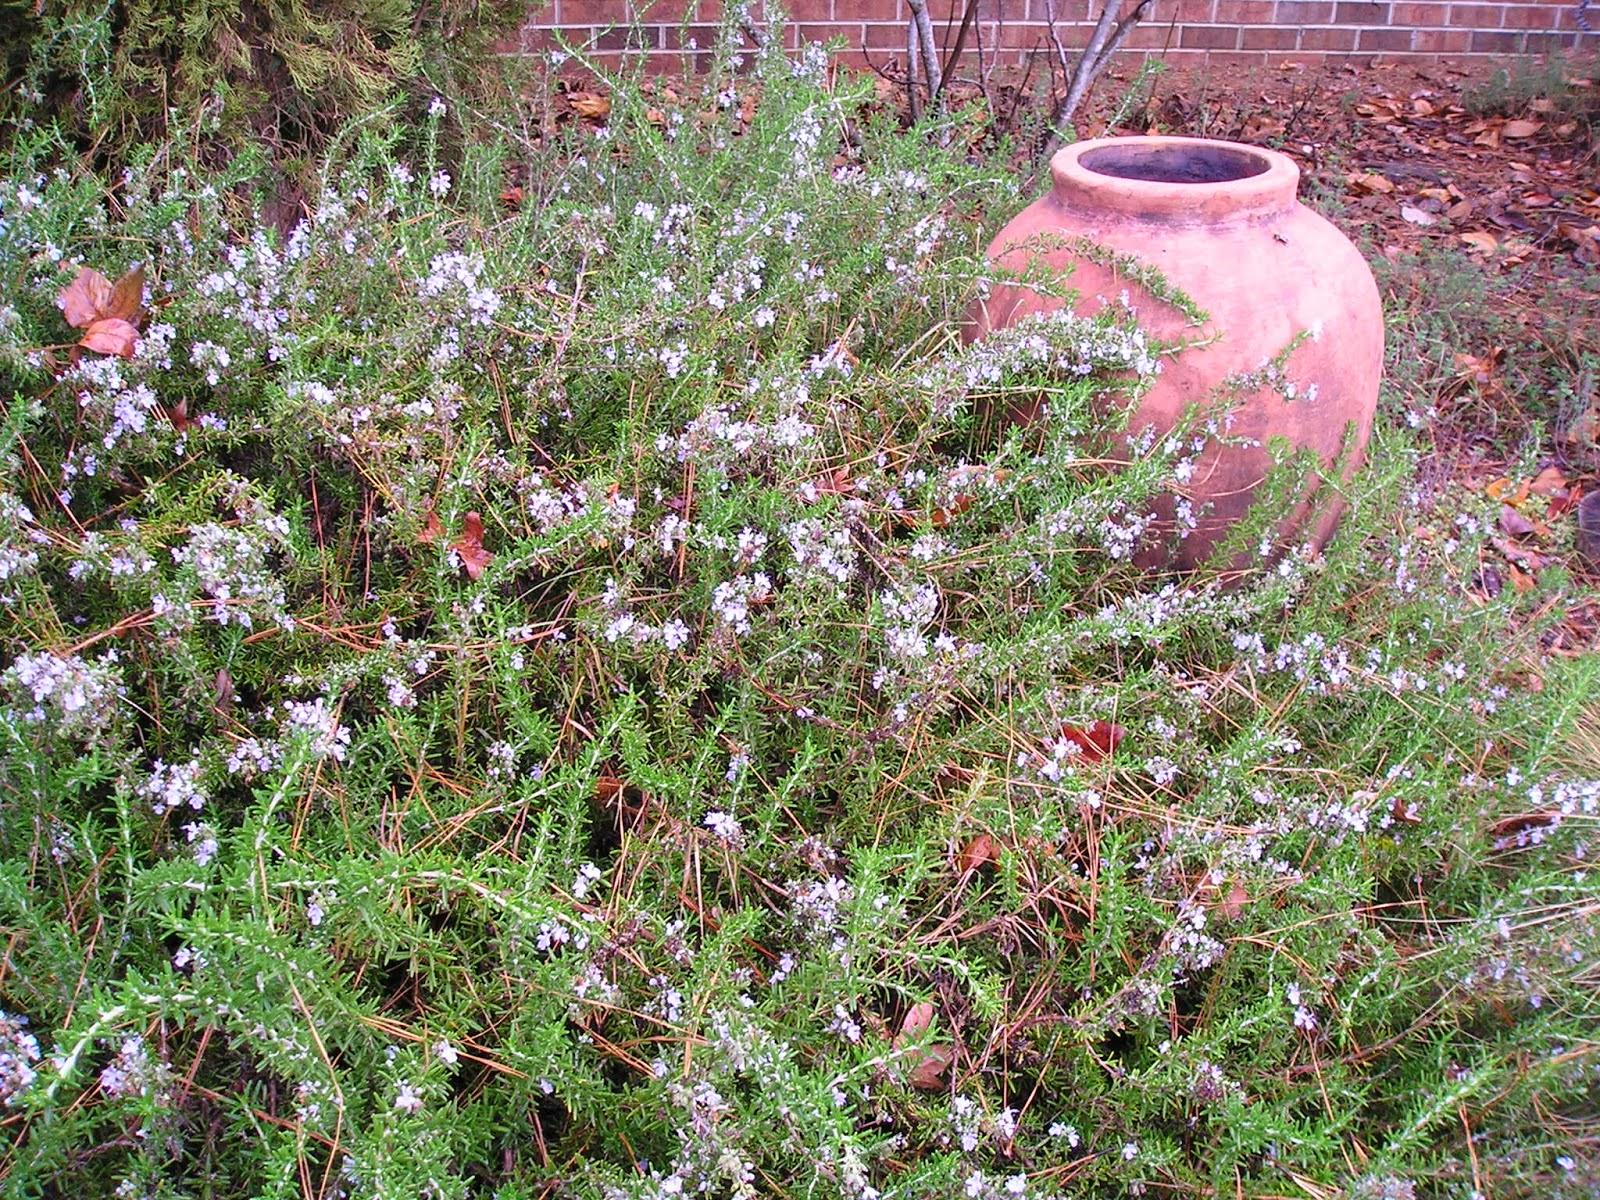 Carol S Garden: Carol's Greenville NC Garden: Rosmarinus Prostratus